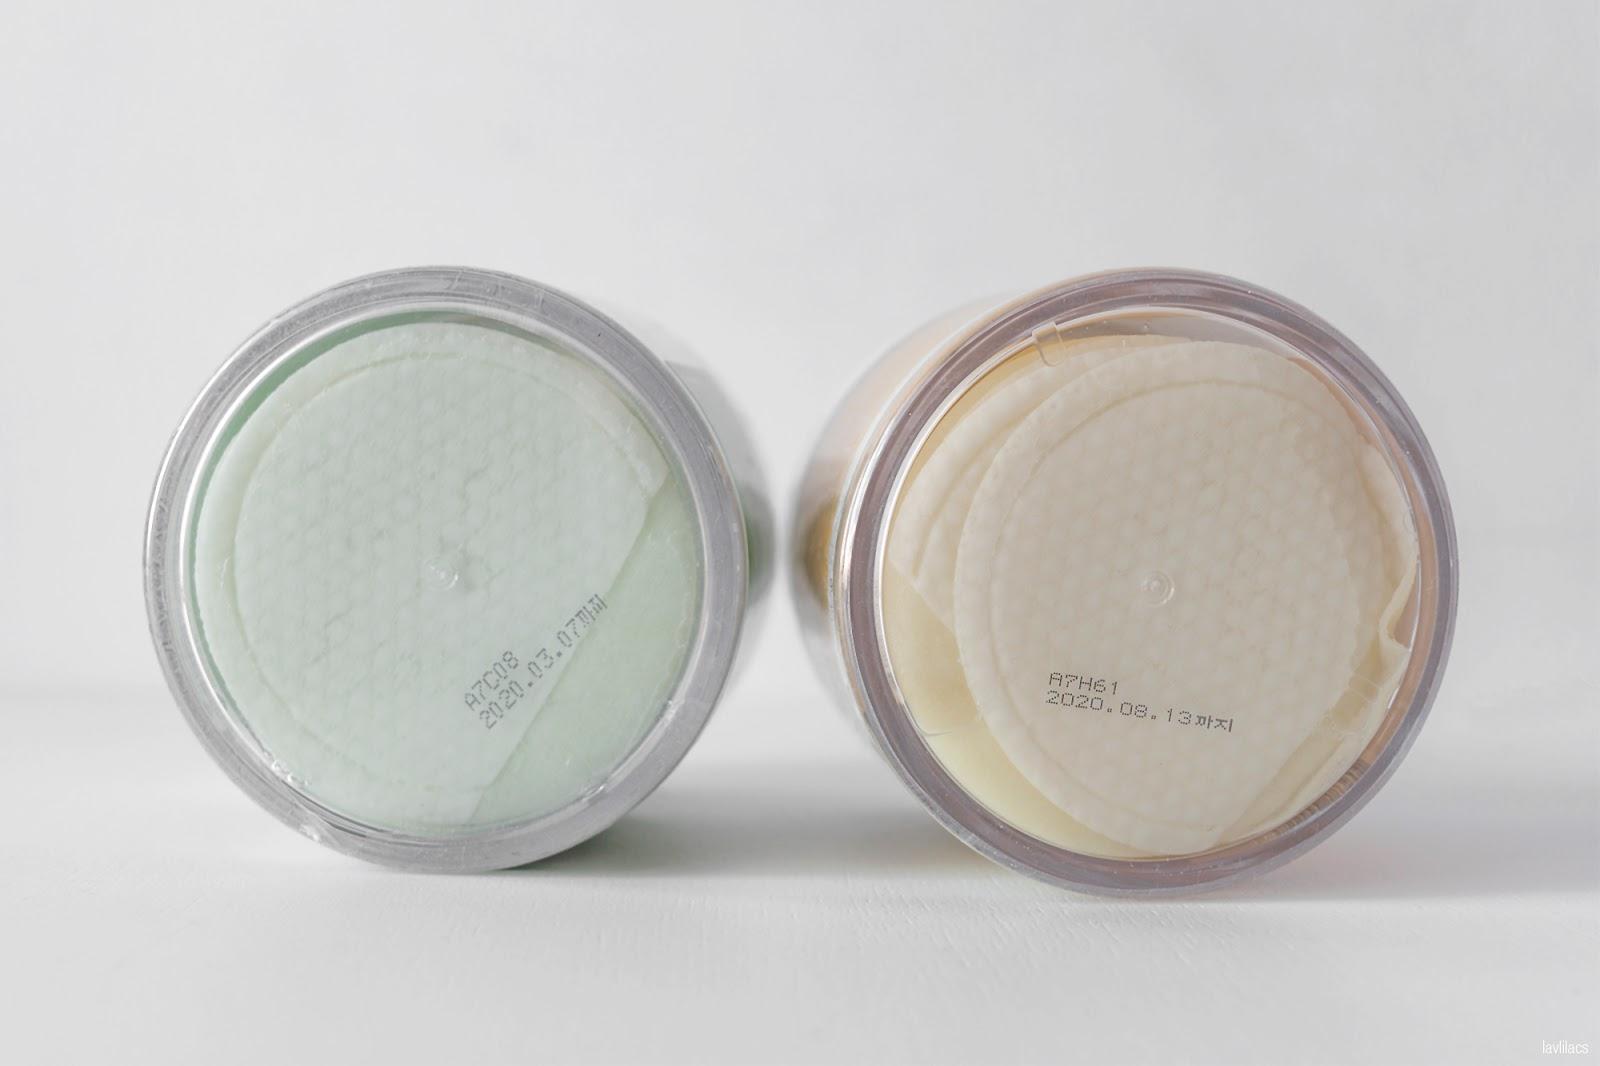 lavlilacs NEOGEN DERMALOGY Bio-Peel Gauze Peeling - Green Tea & Lemon packaging expiration